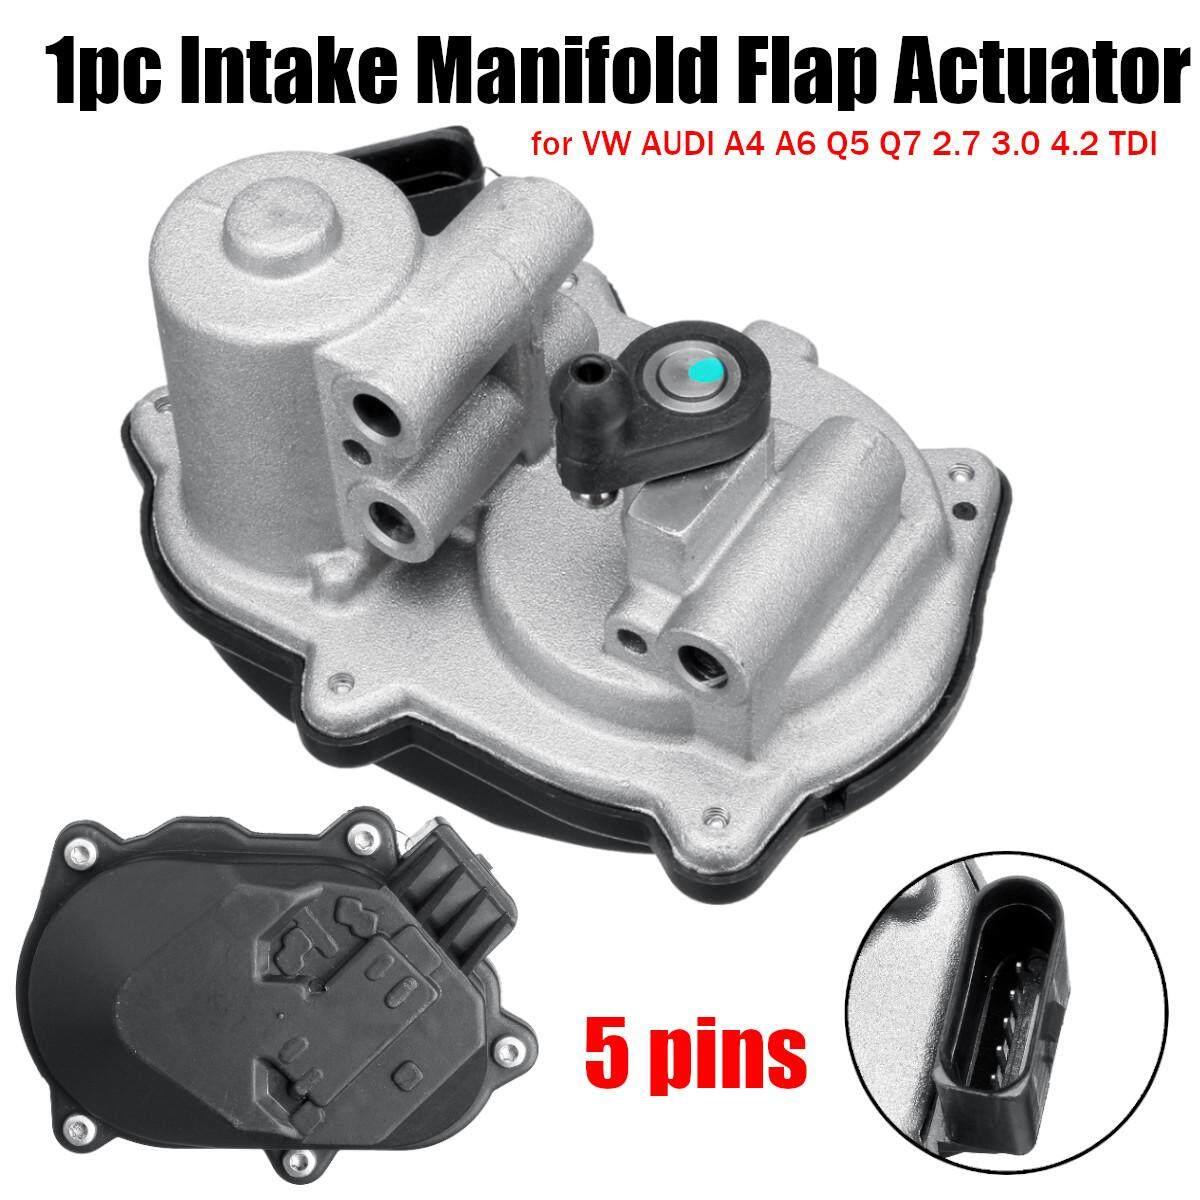 Asupan Flap Lipat Ganda Mesin Aktuator Untuk Audi Vw 2.7 3.0 4.2 A4 A6 Q5 Q7 059129086 K By Autoleader.